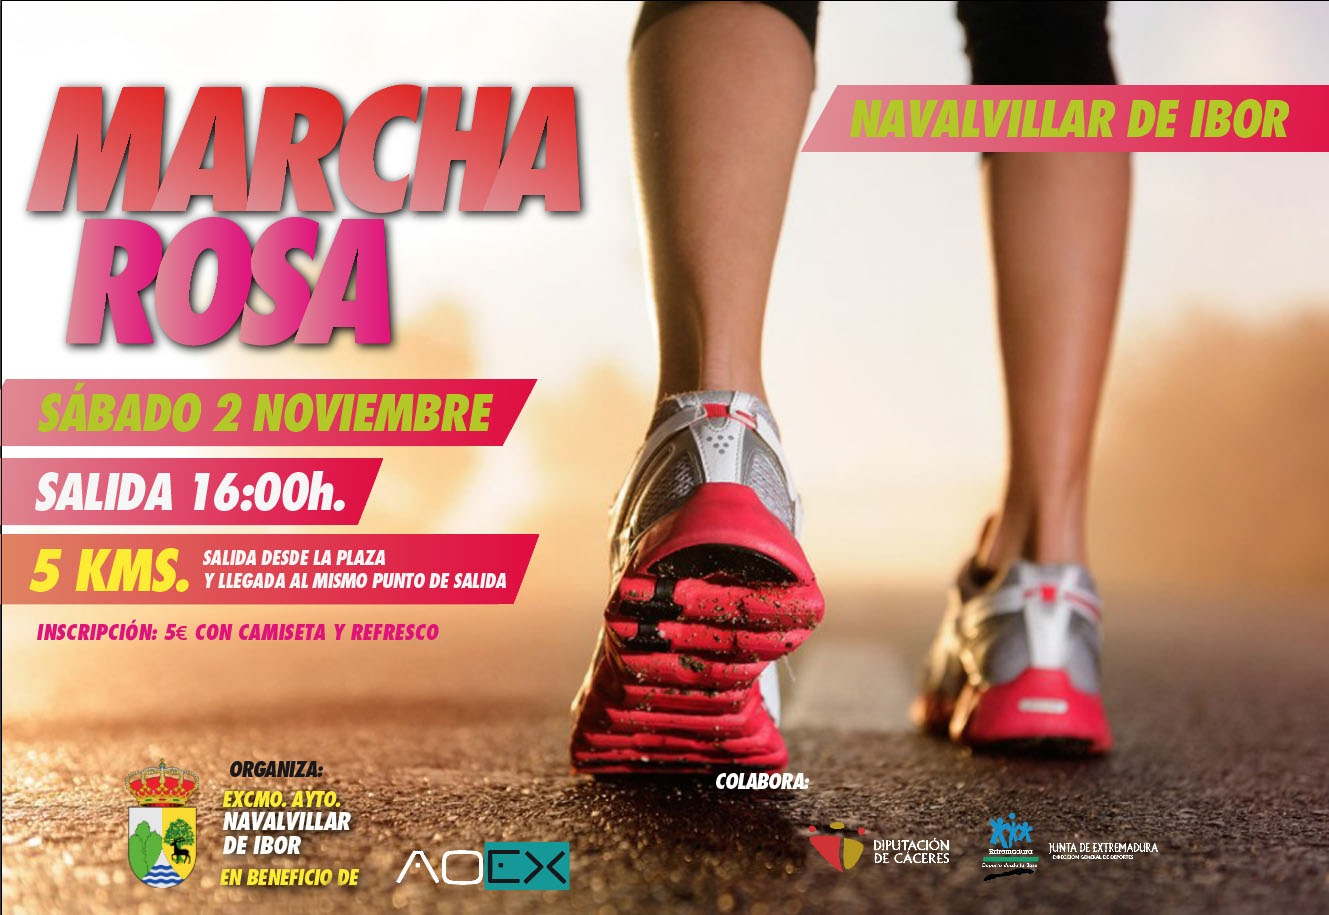 Marcha rosa 2019 - Navalvillar de Ibor (Cáceres)